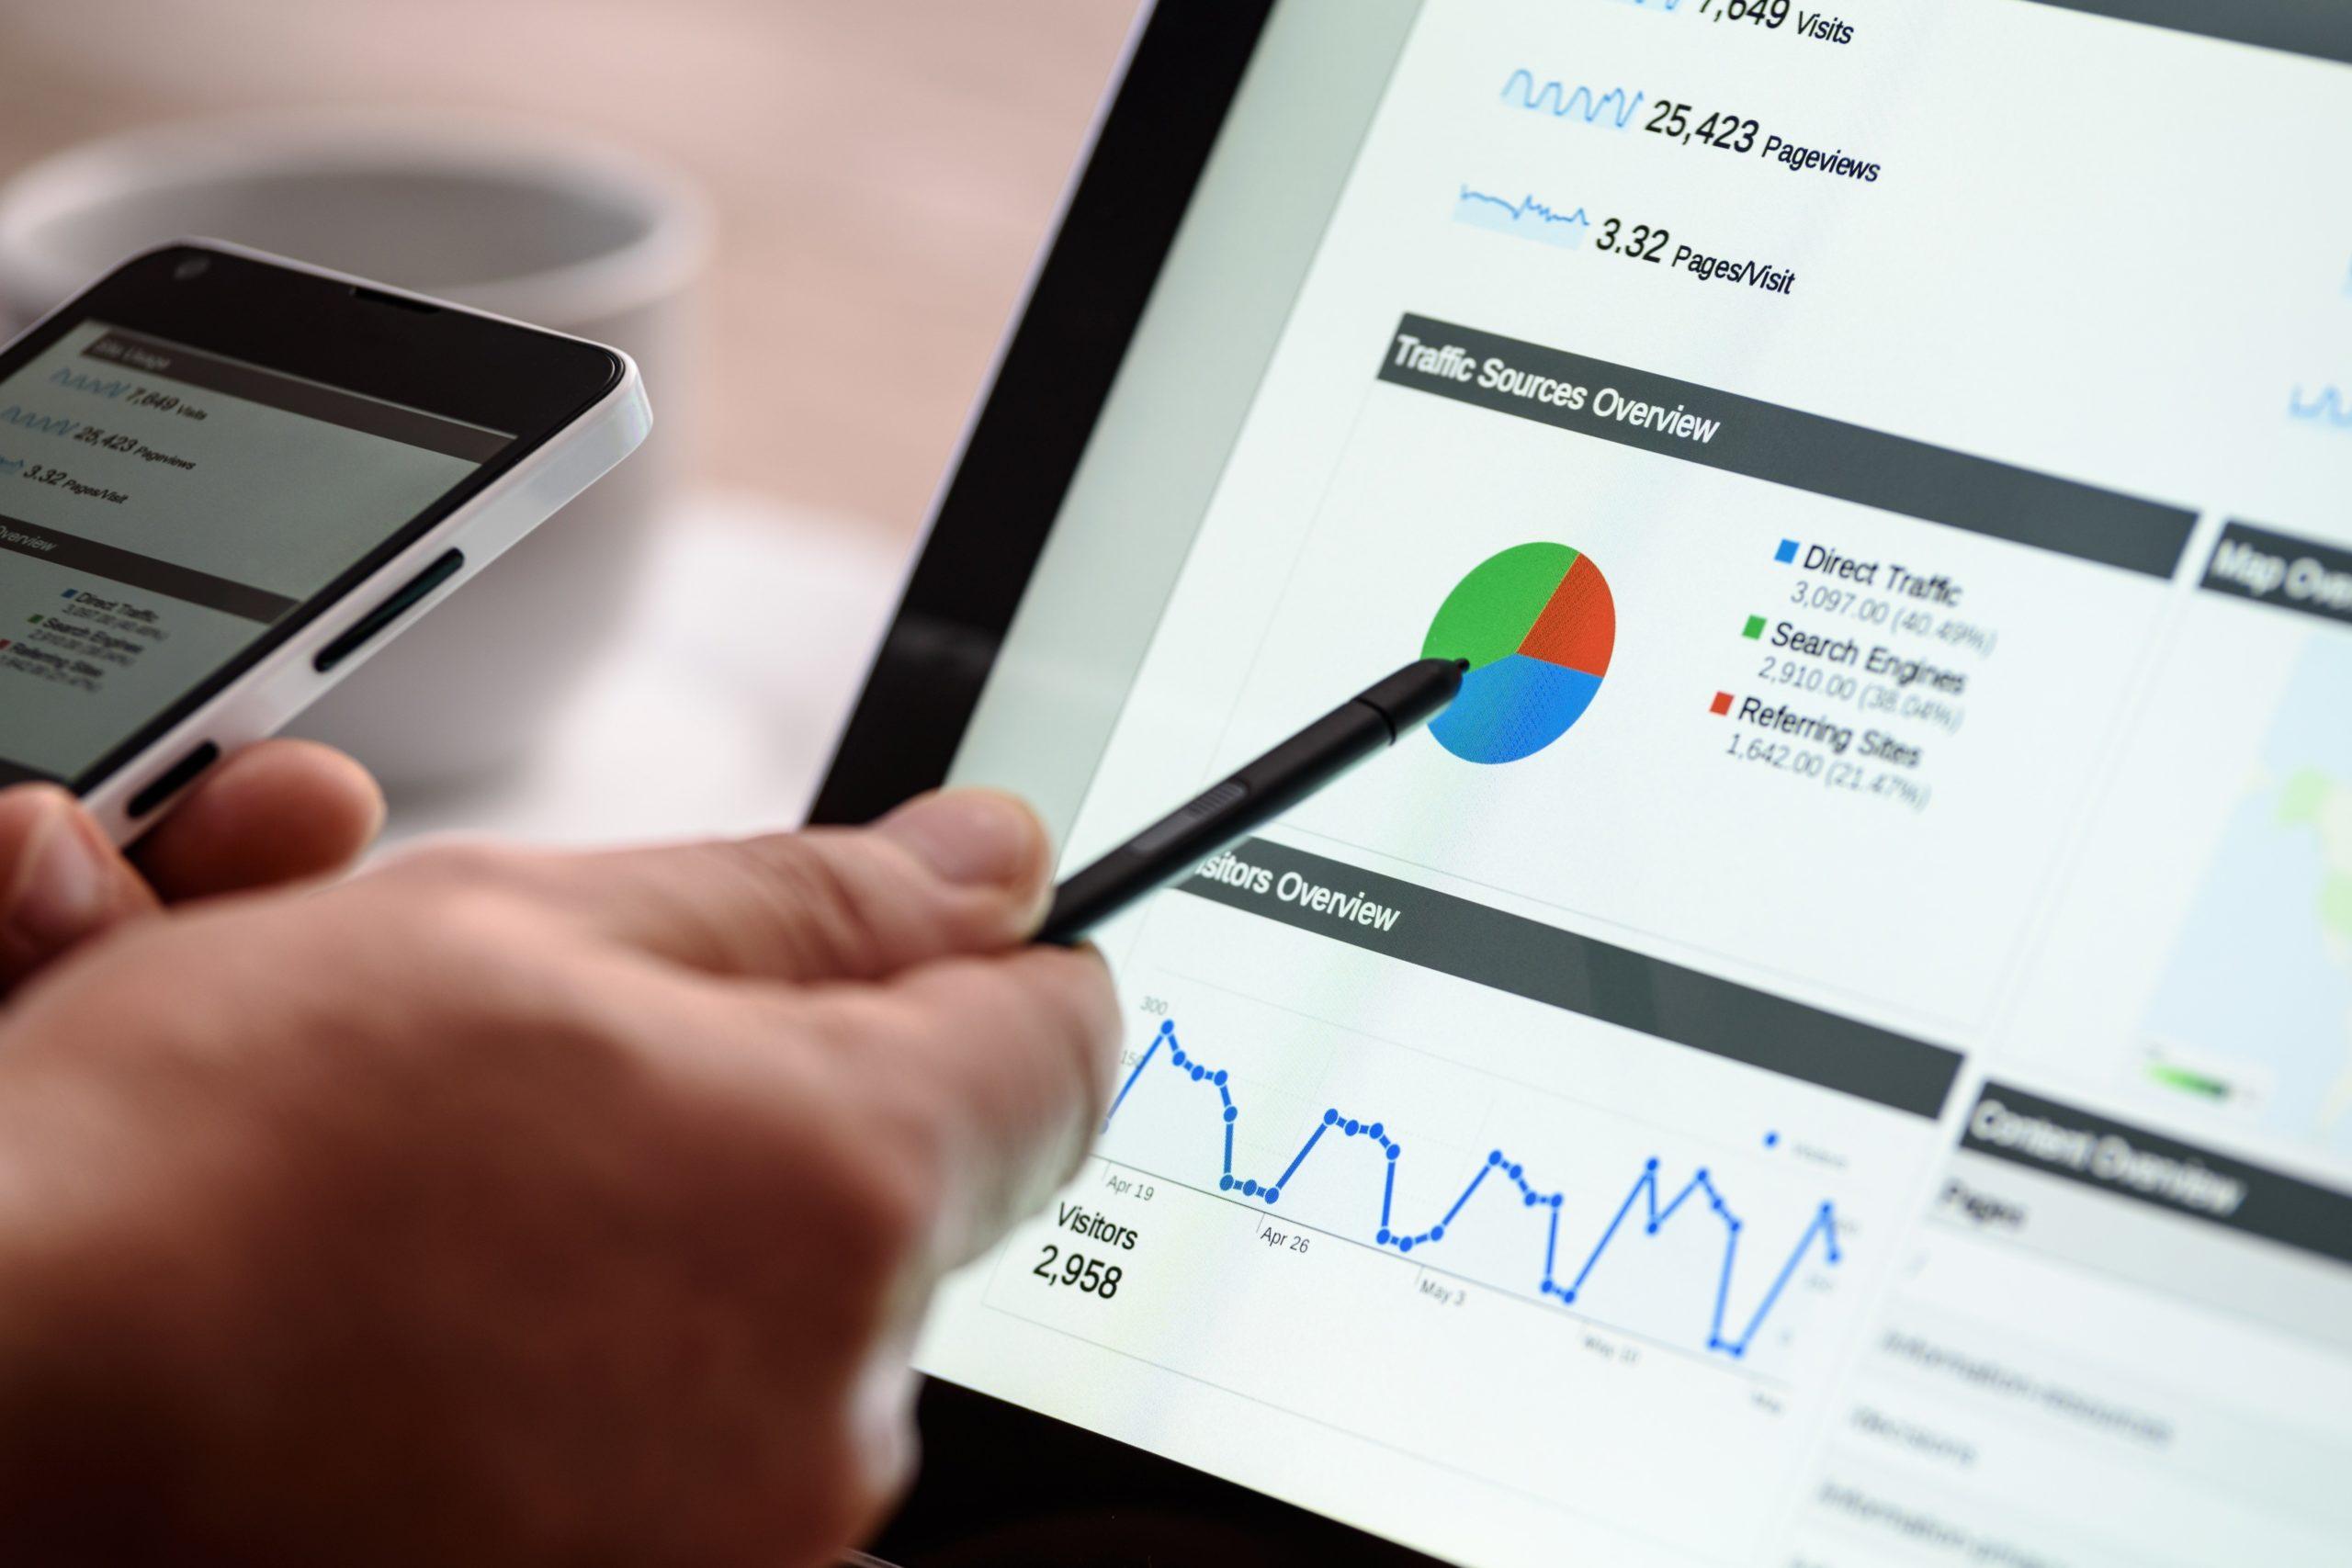 Digital marketing - analytics dashboard view